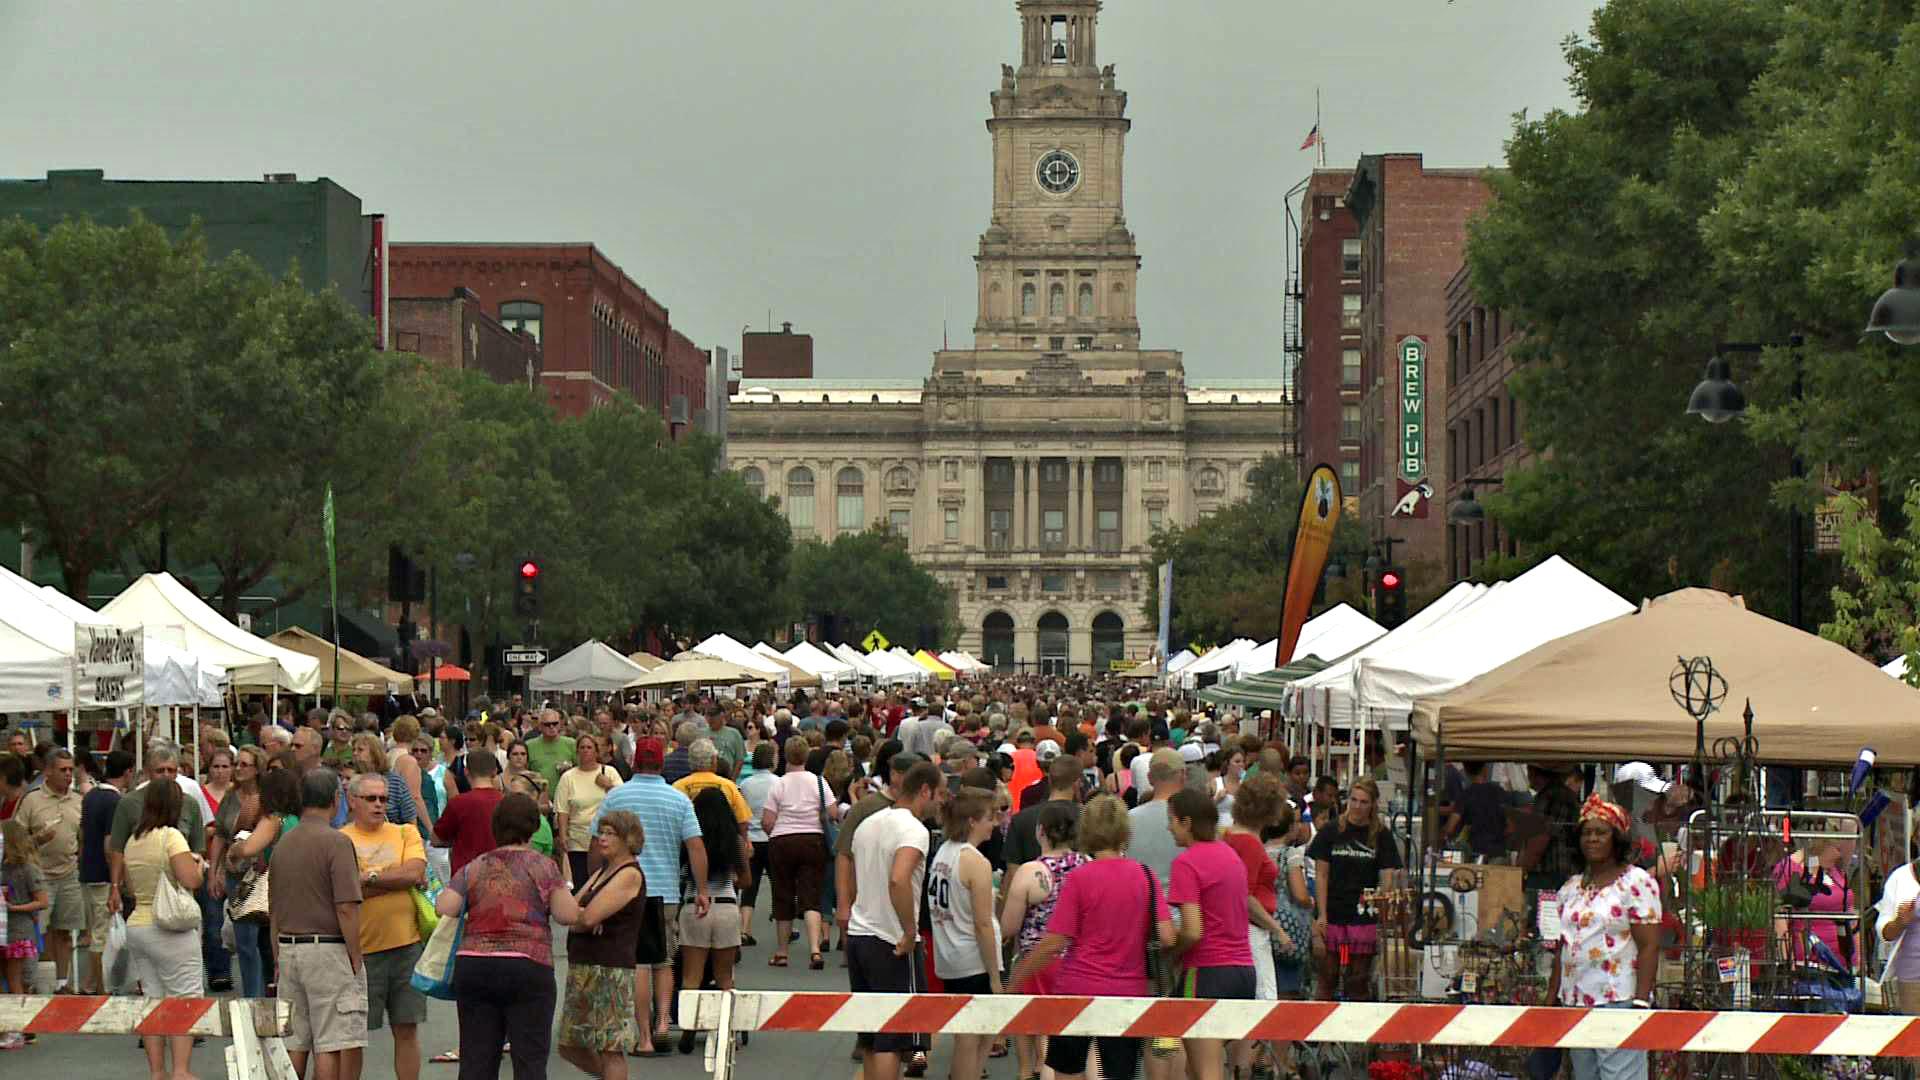 The Des Moines Farmers Market (Photo courtesy of Slow Food Des Moines)